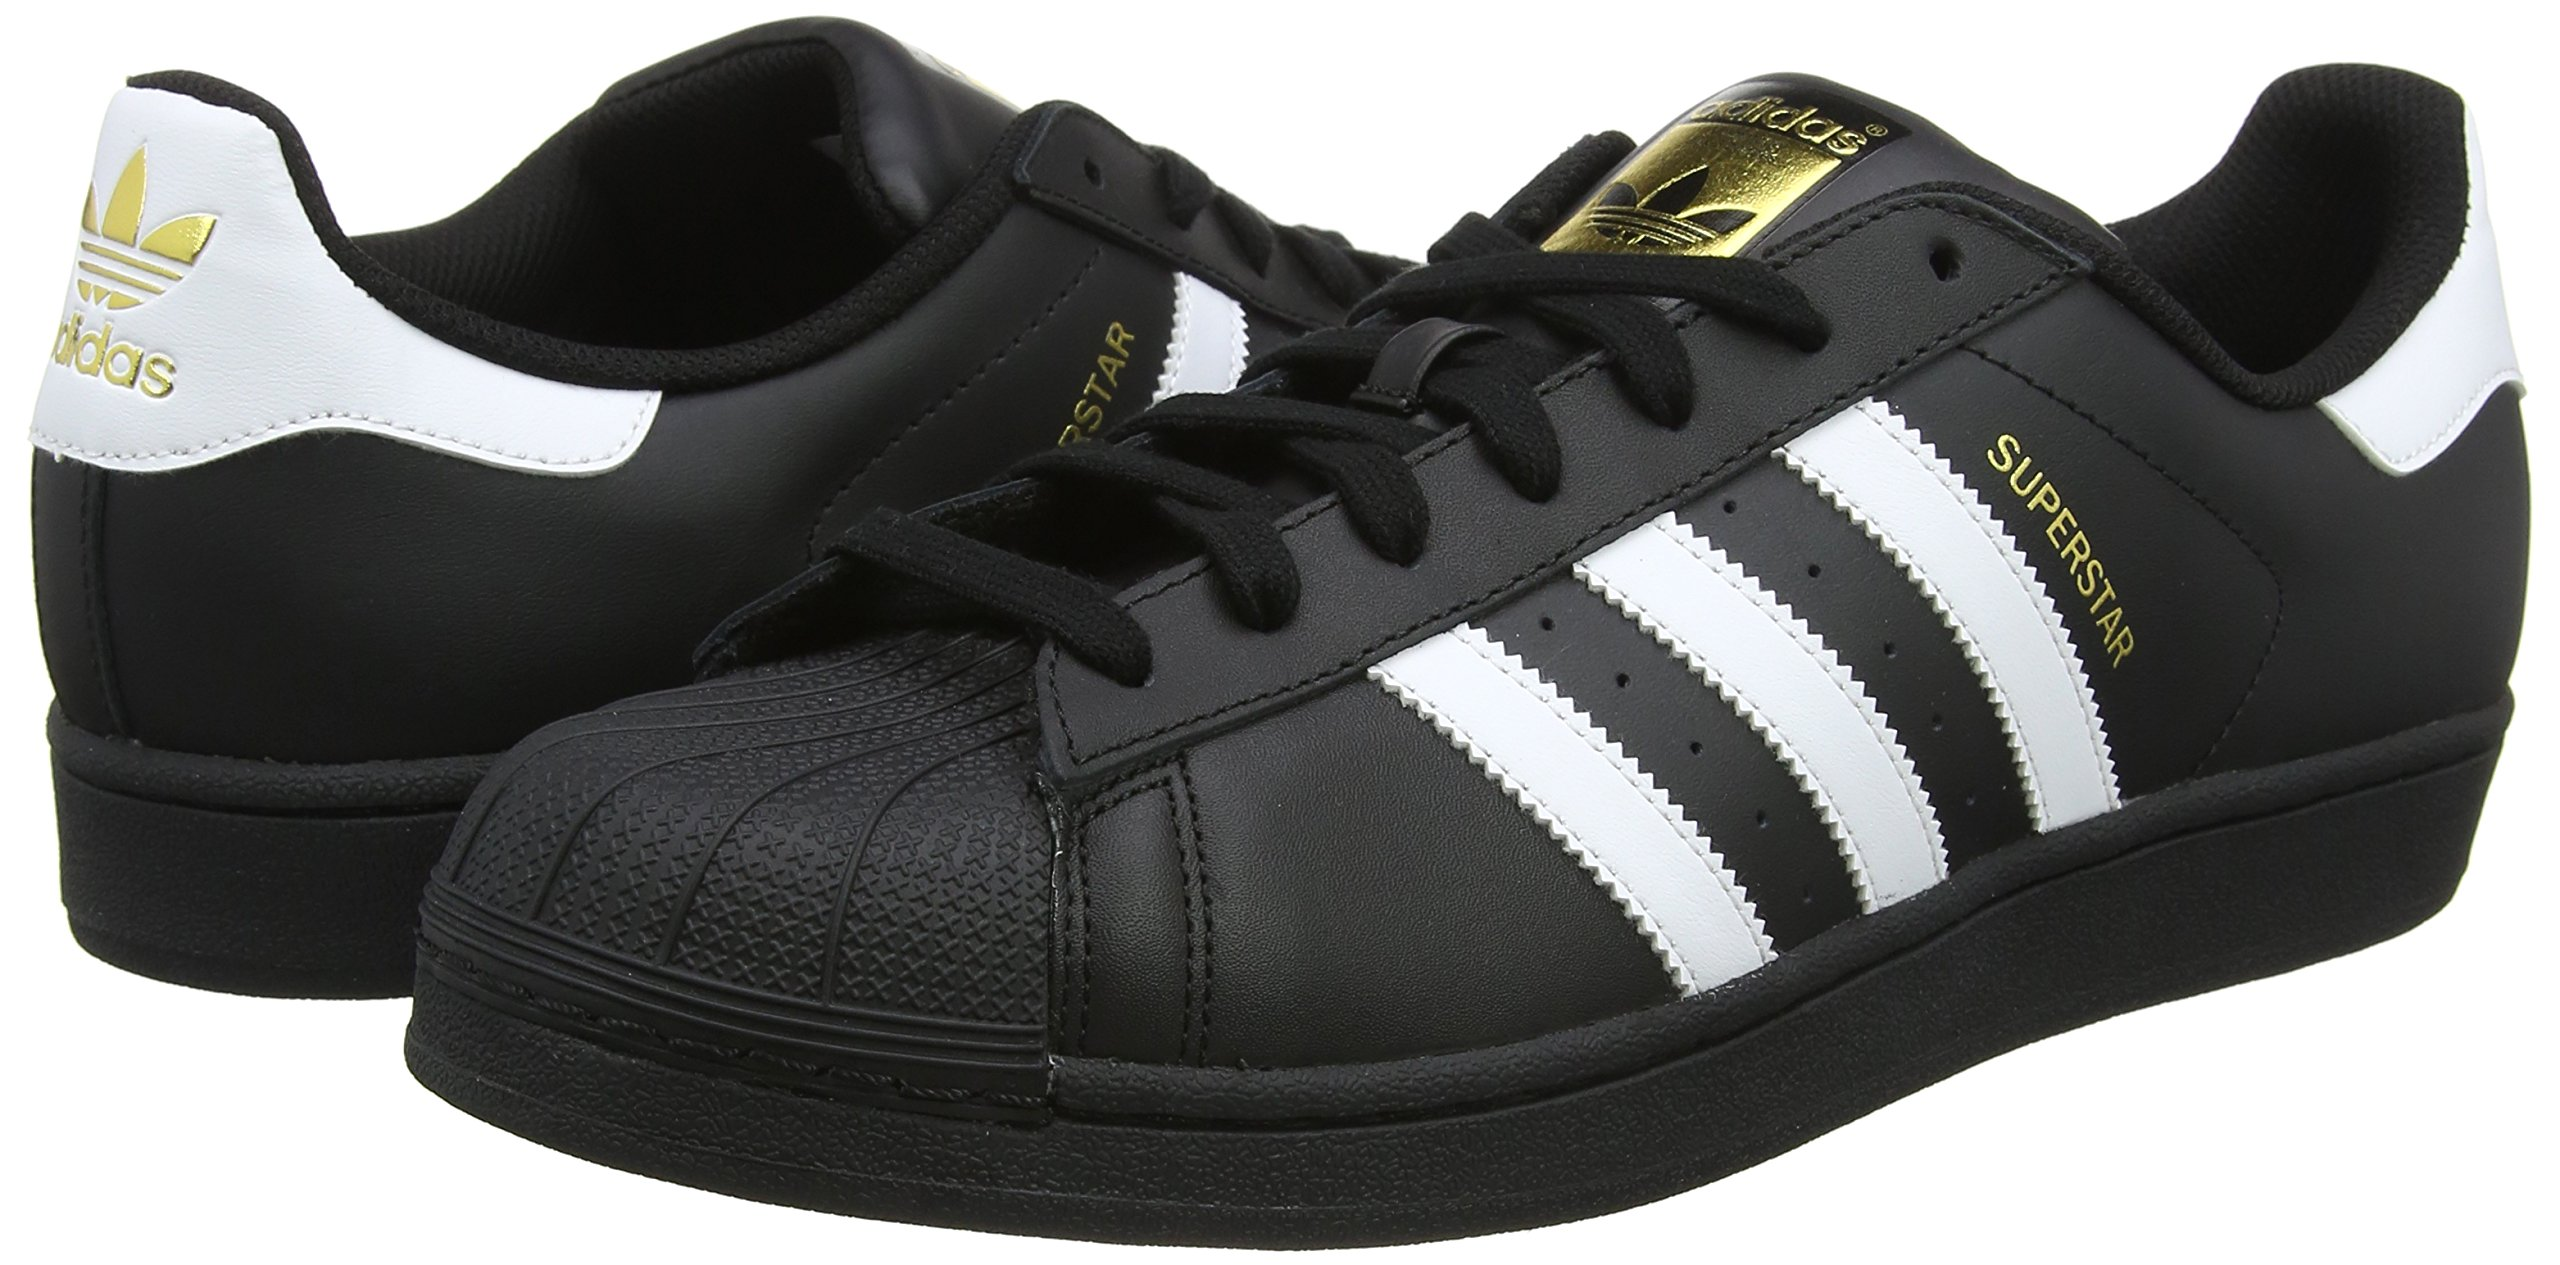 Adidas Originals Superstar Foundation Scarpe da Ginnastica Unisex - Adulto 5 spesavip